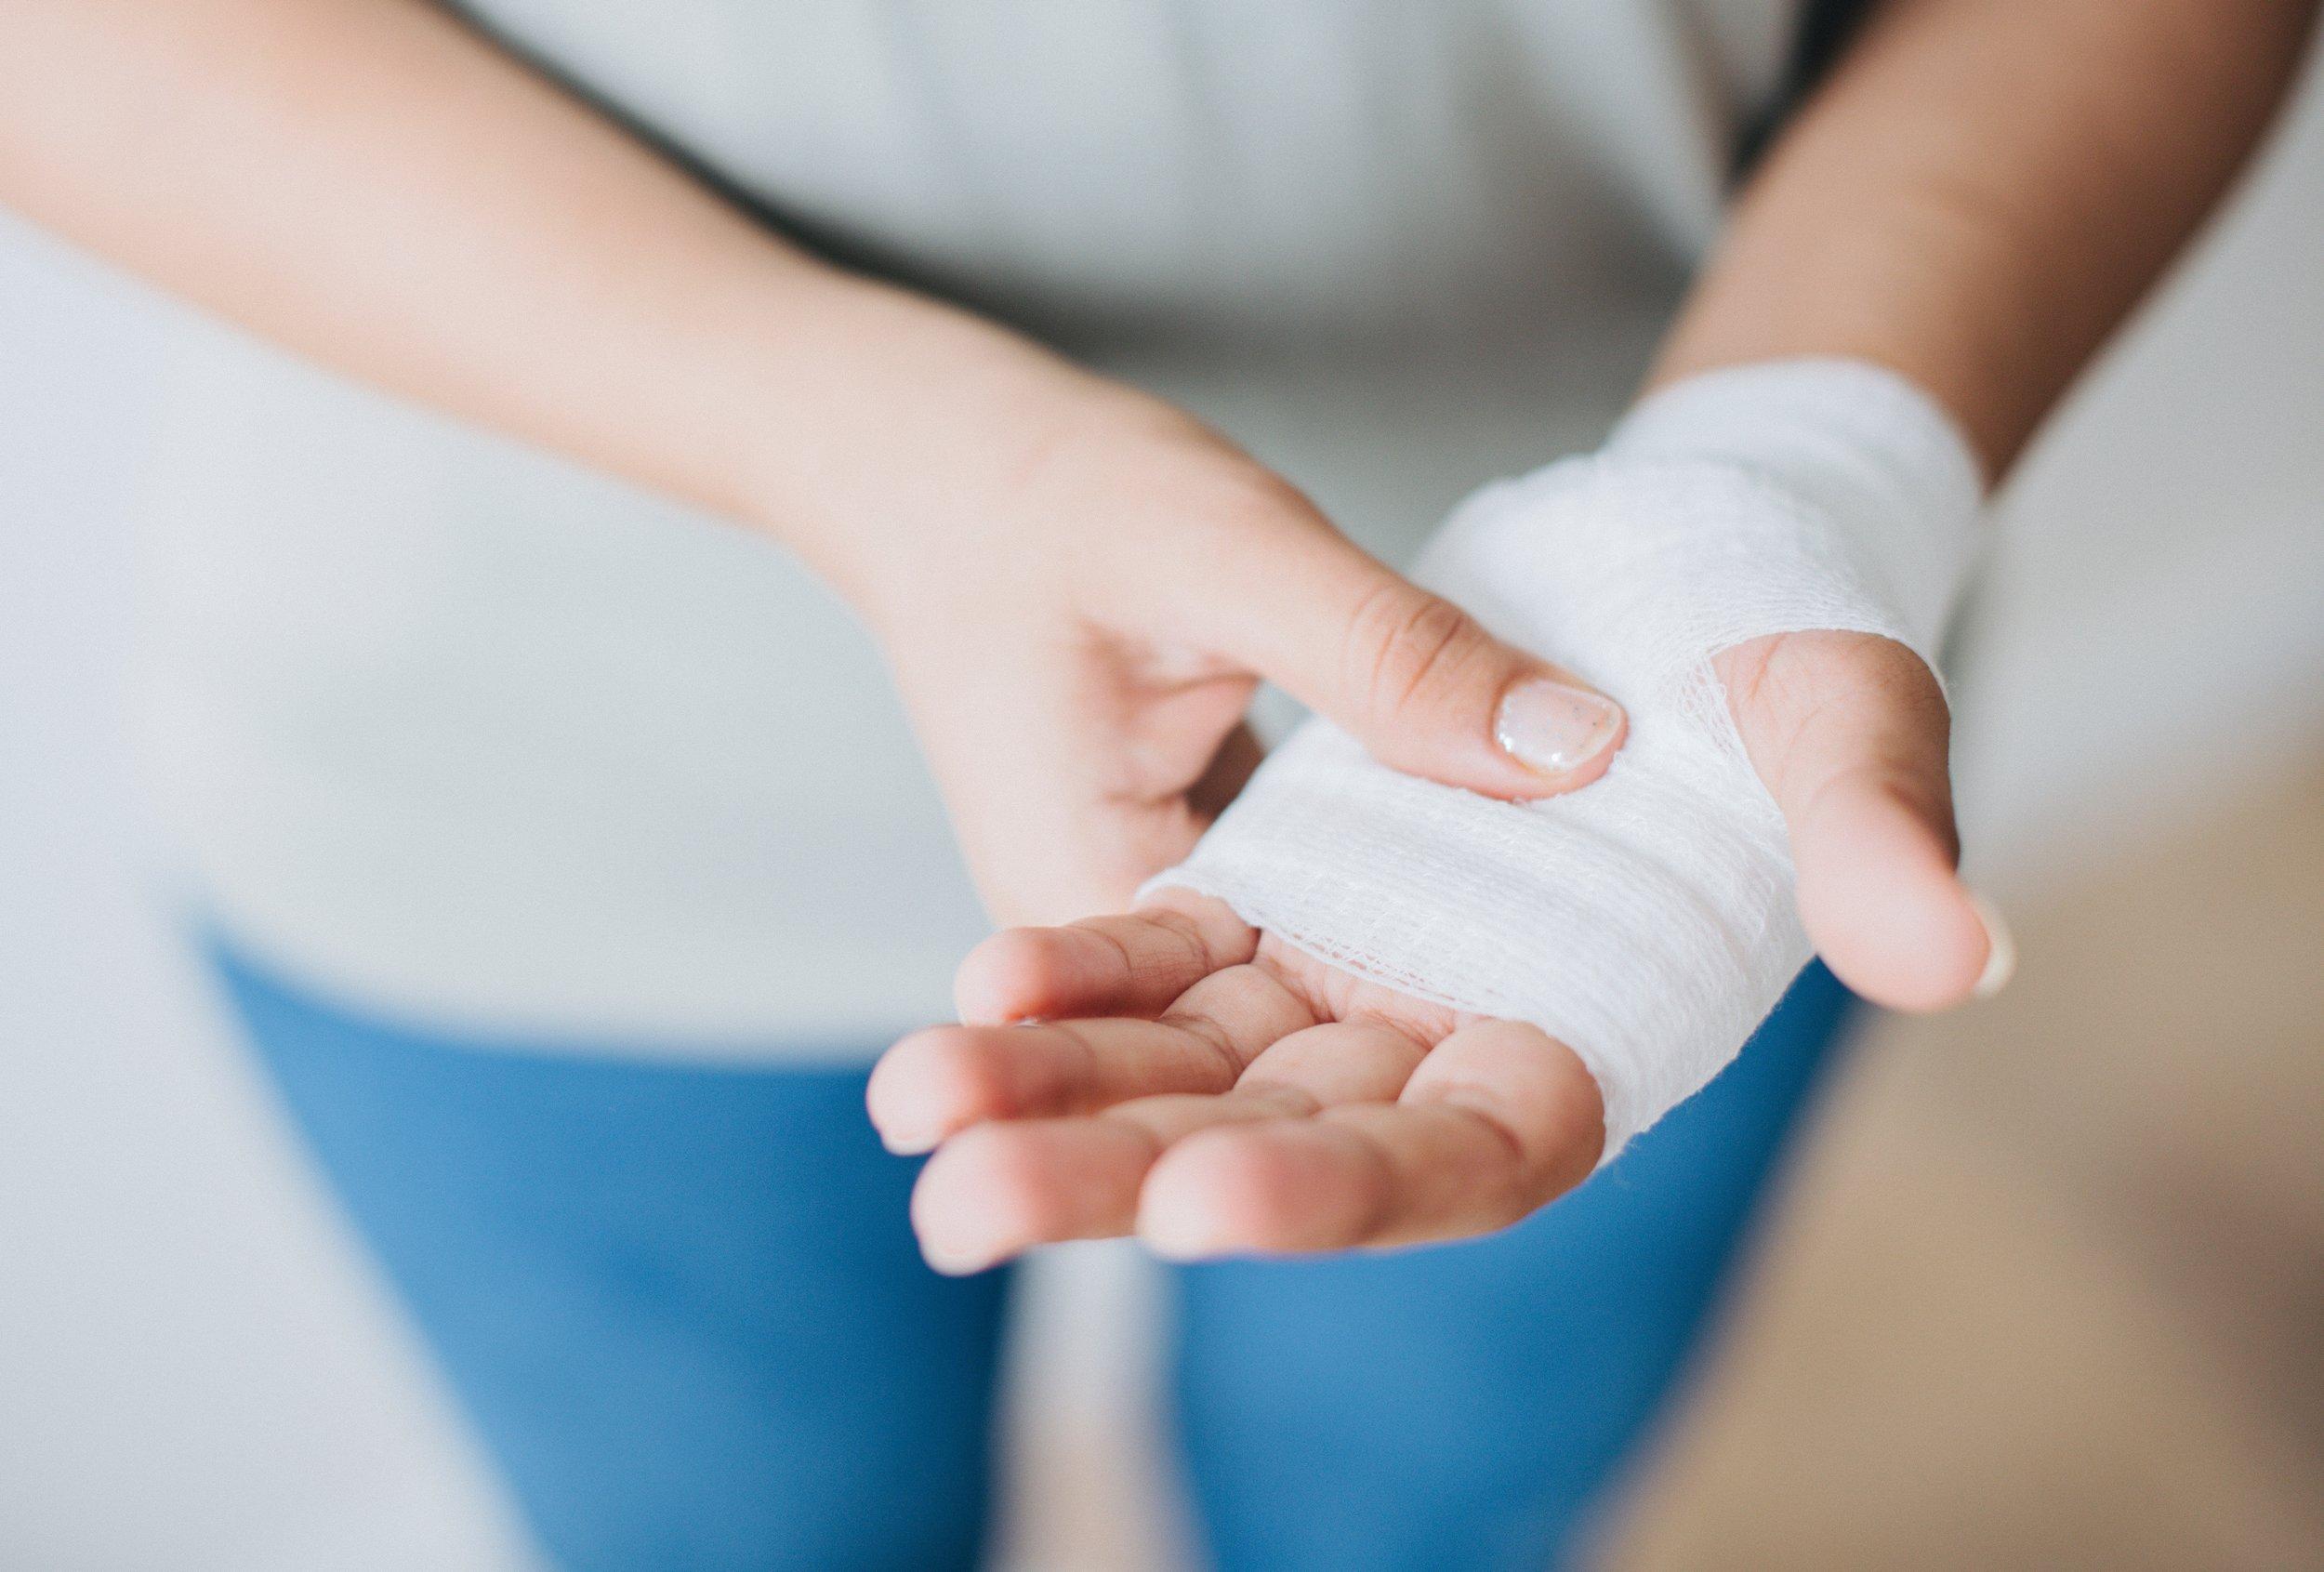 5 tips for building a zero waste first aid kit from www.goingzerowaste.com #zerowaste #firstaidkit #ecofriendly